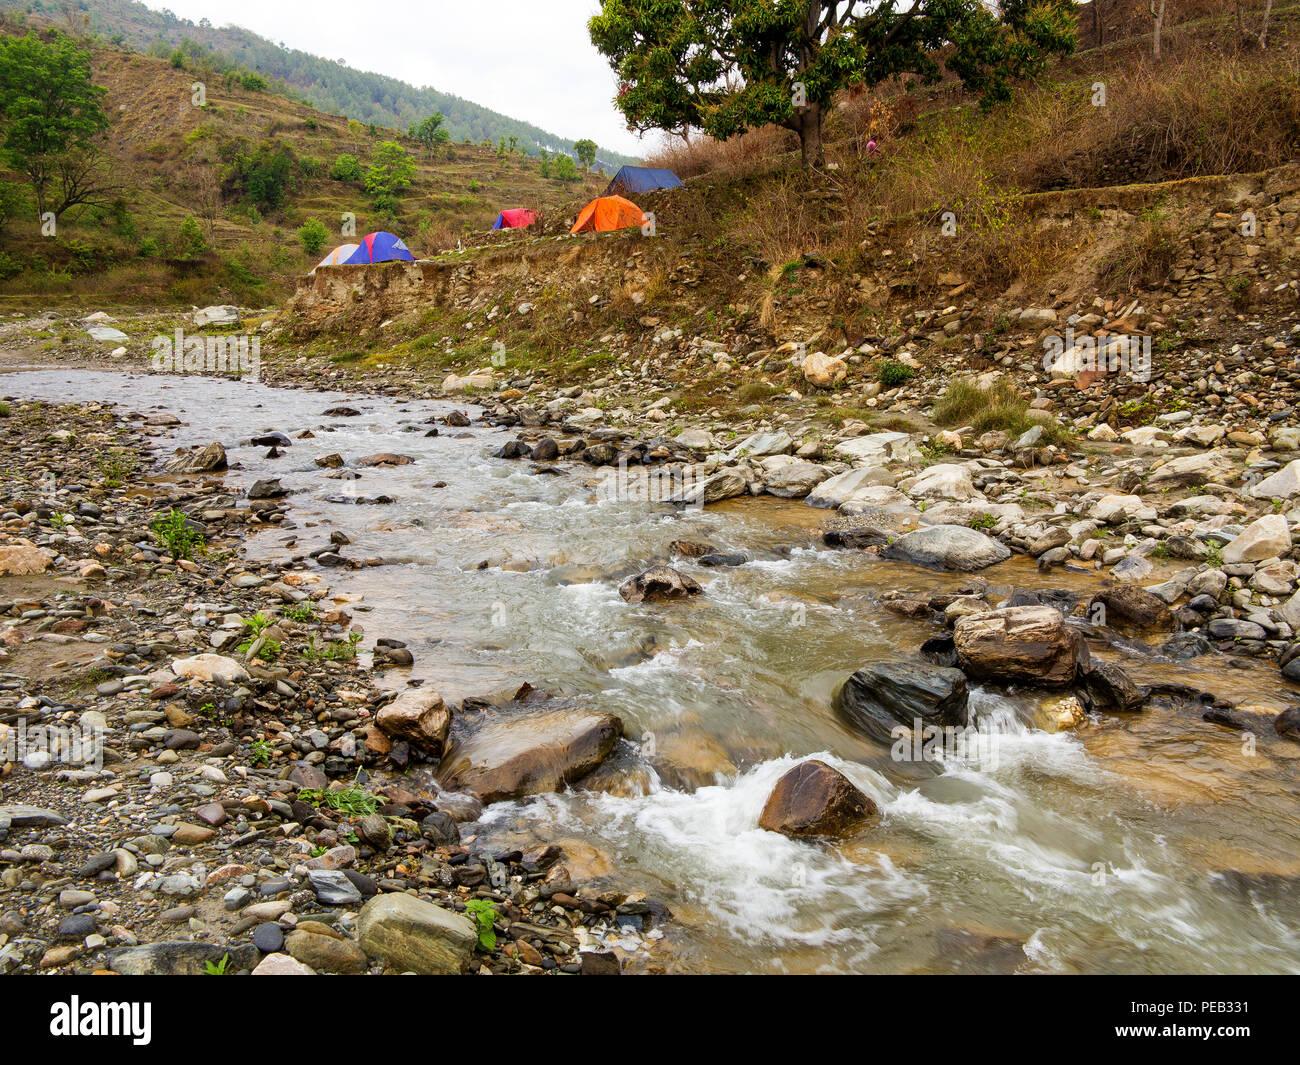 Campamento a orillas del río Panar, colinas de Kumaon, Uttarakhand, India Imagen De Stock